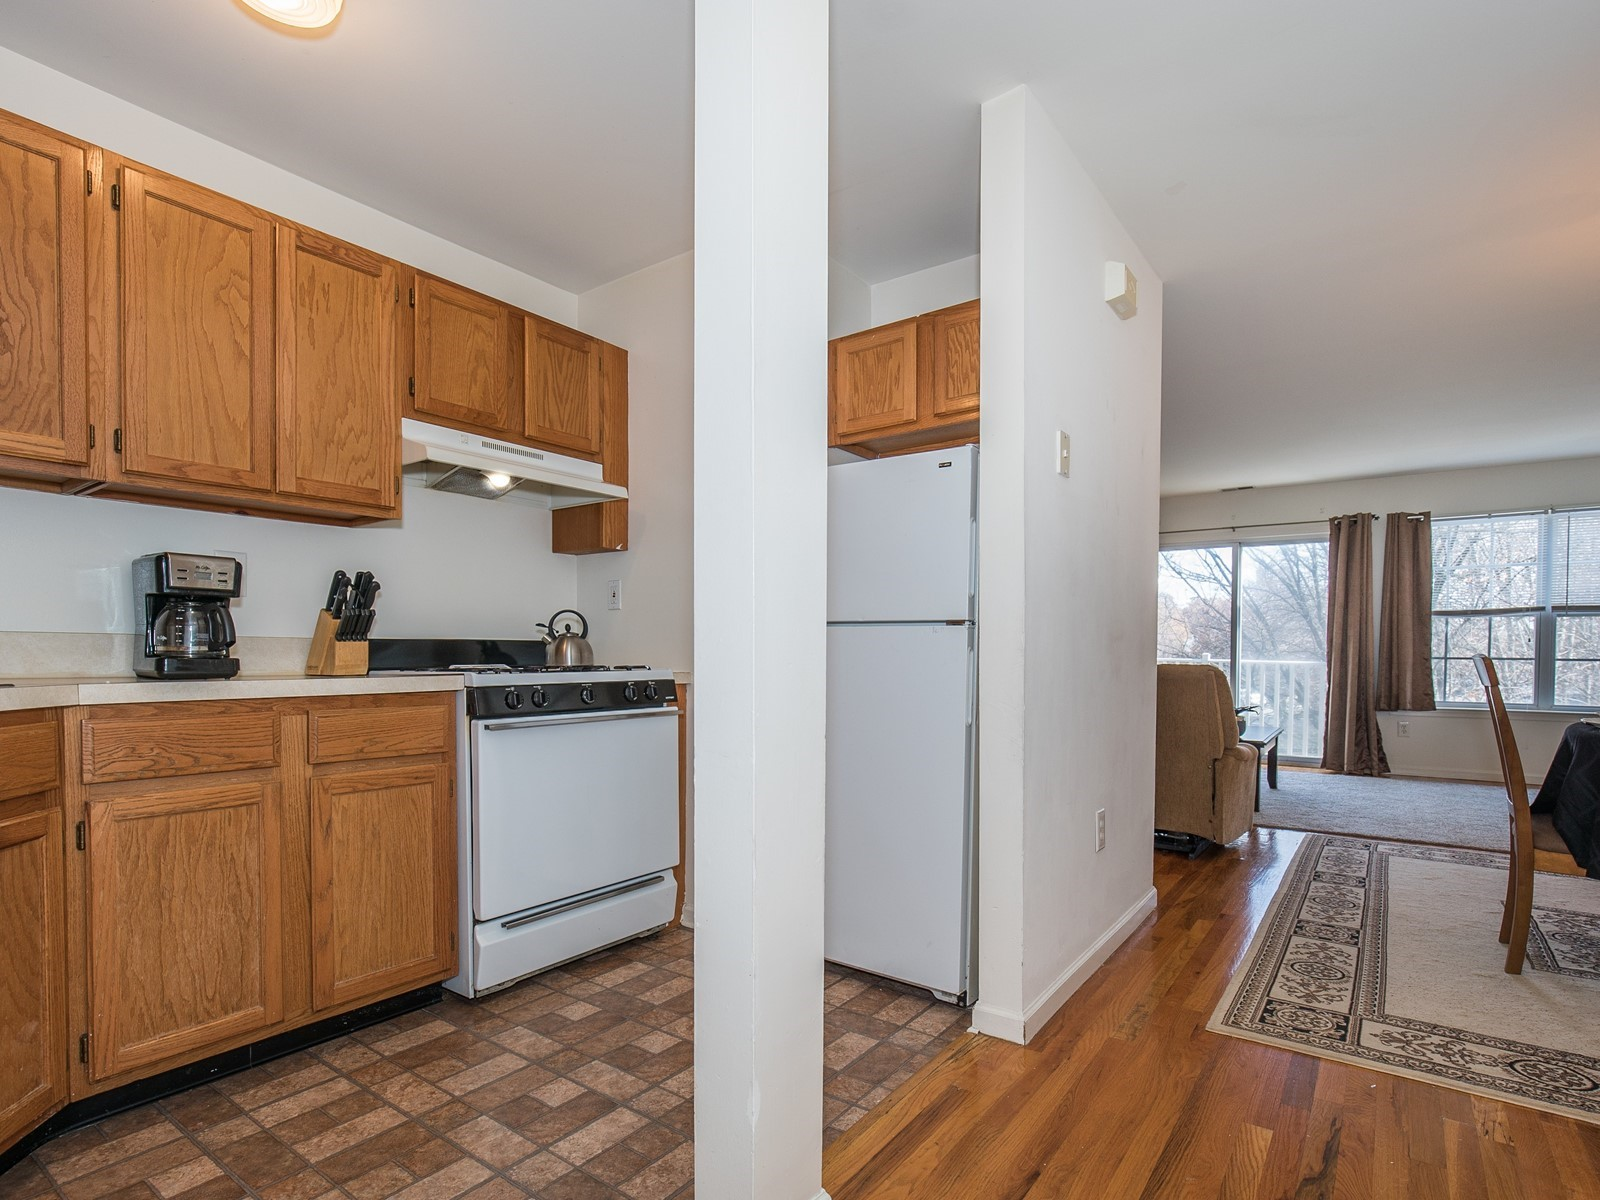 06_TemporaryHousing-South-Plainfield-721_Kitchen2